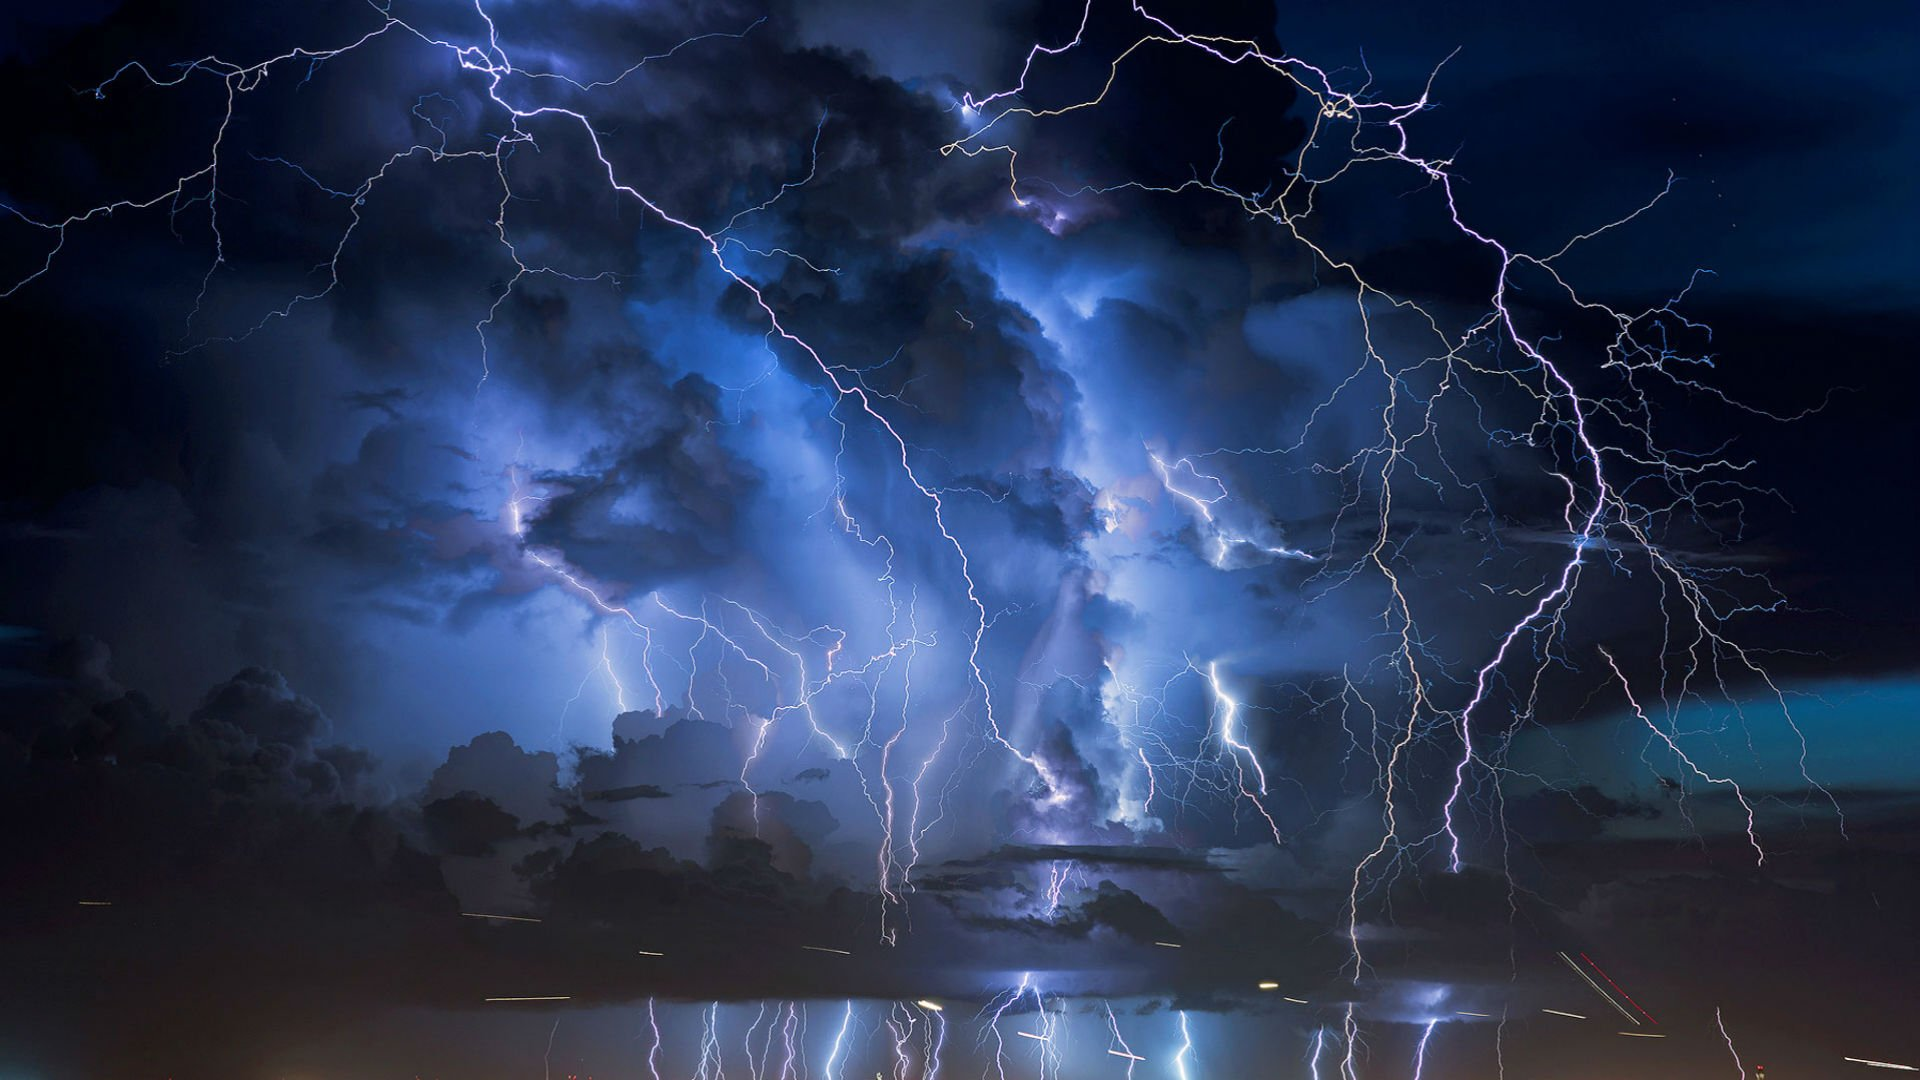 STORM weather rain sky clouds nature lightning city cities ...